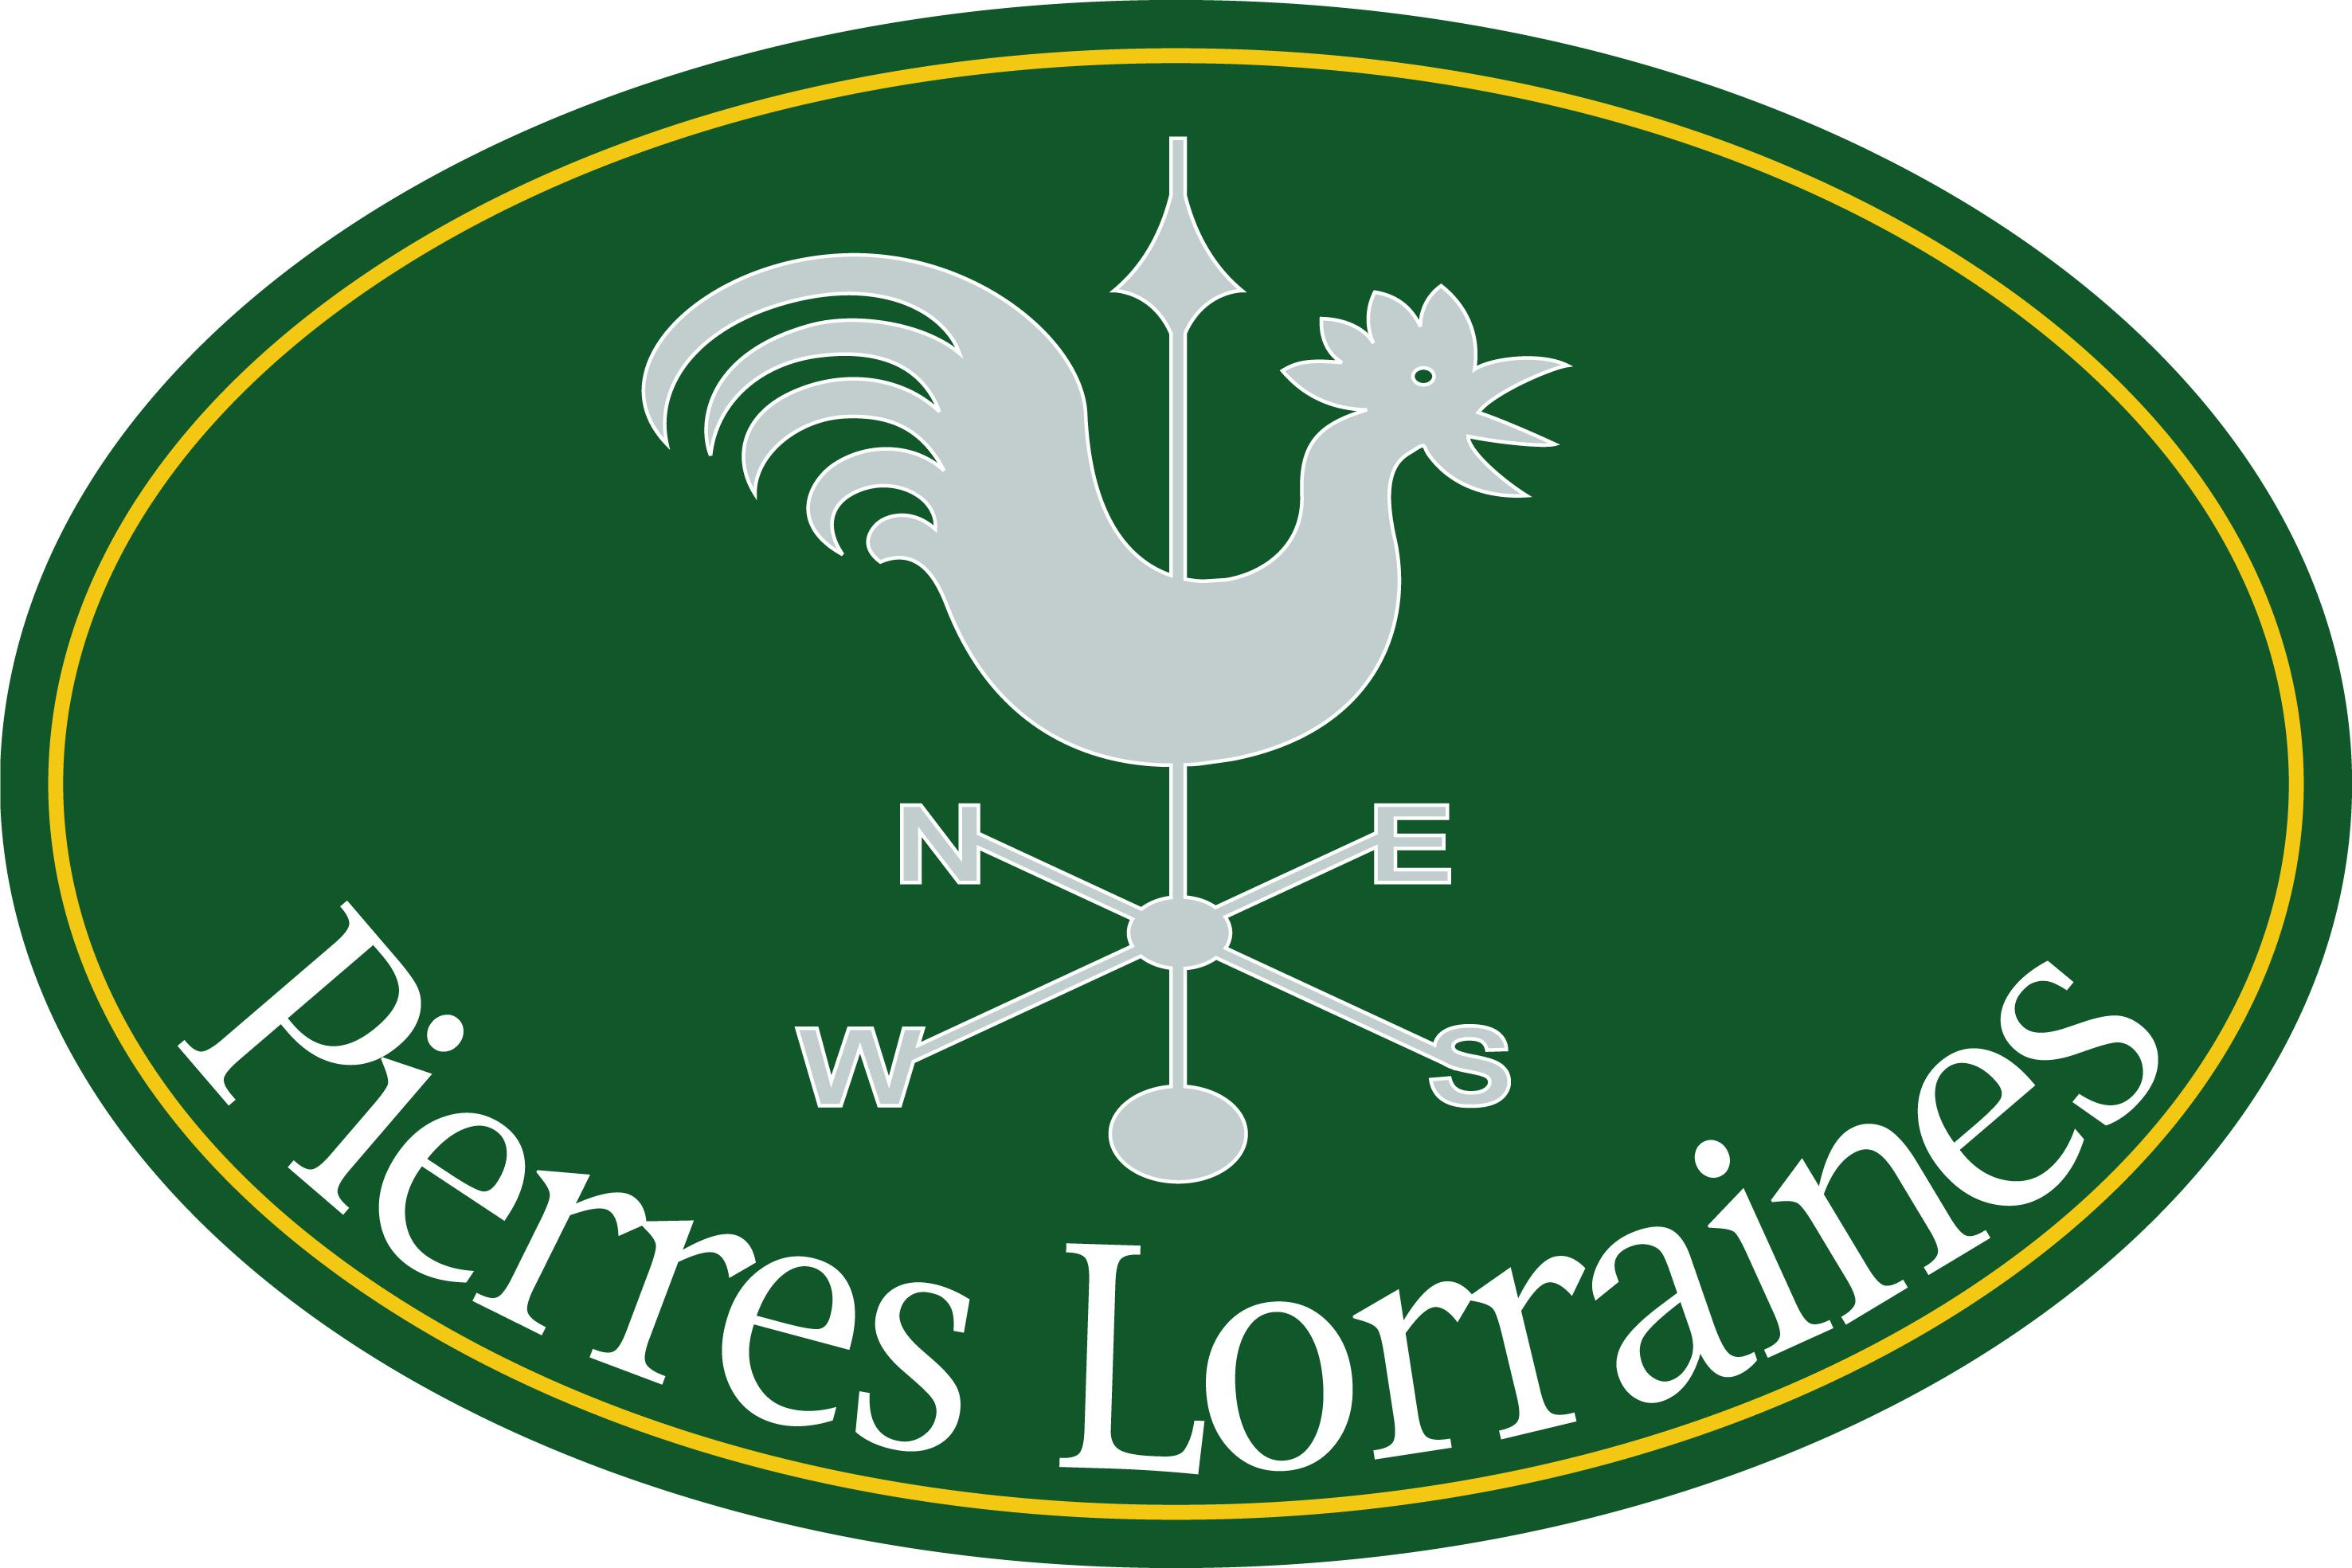 PIERRES LORRAINES